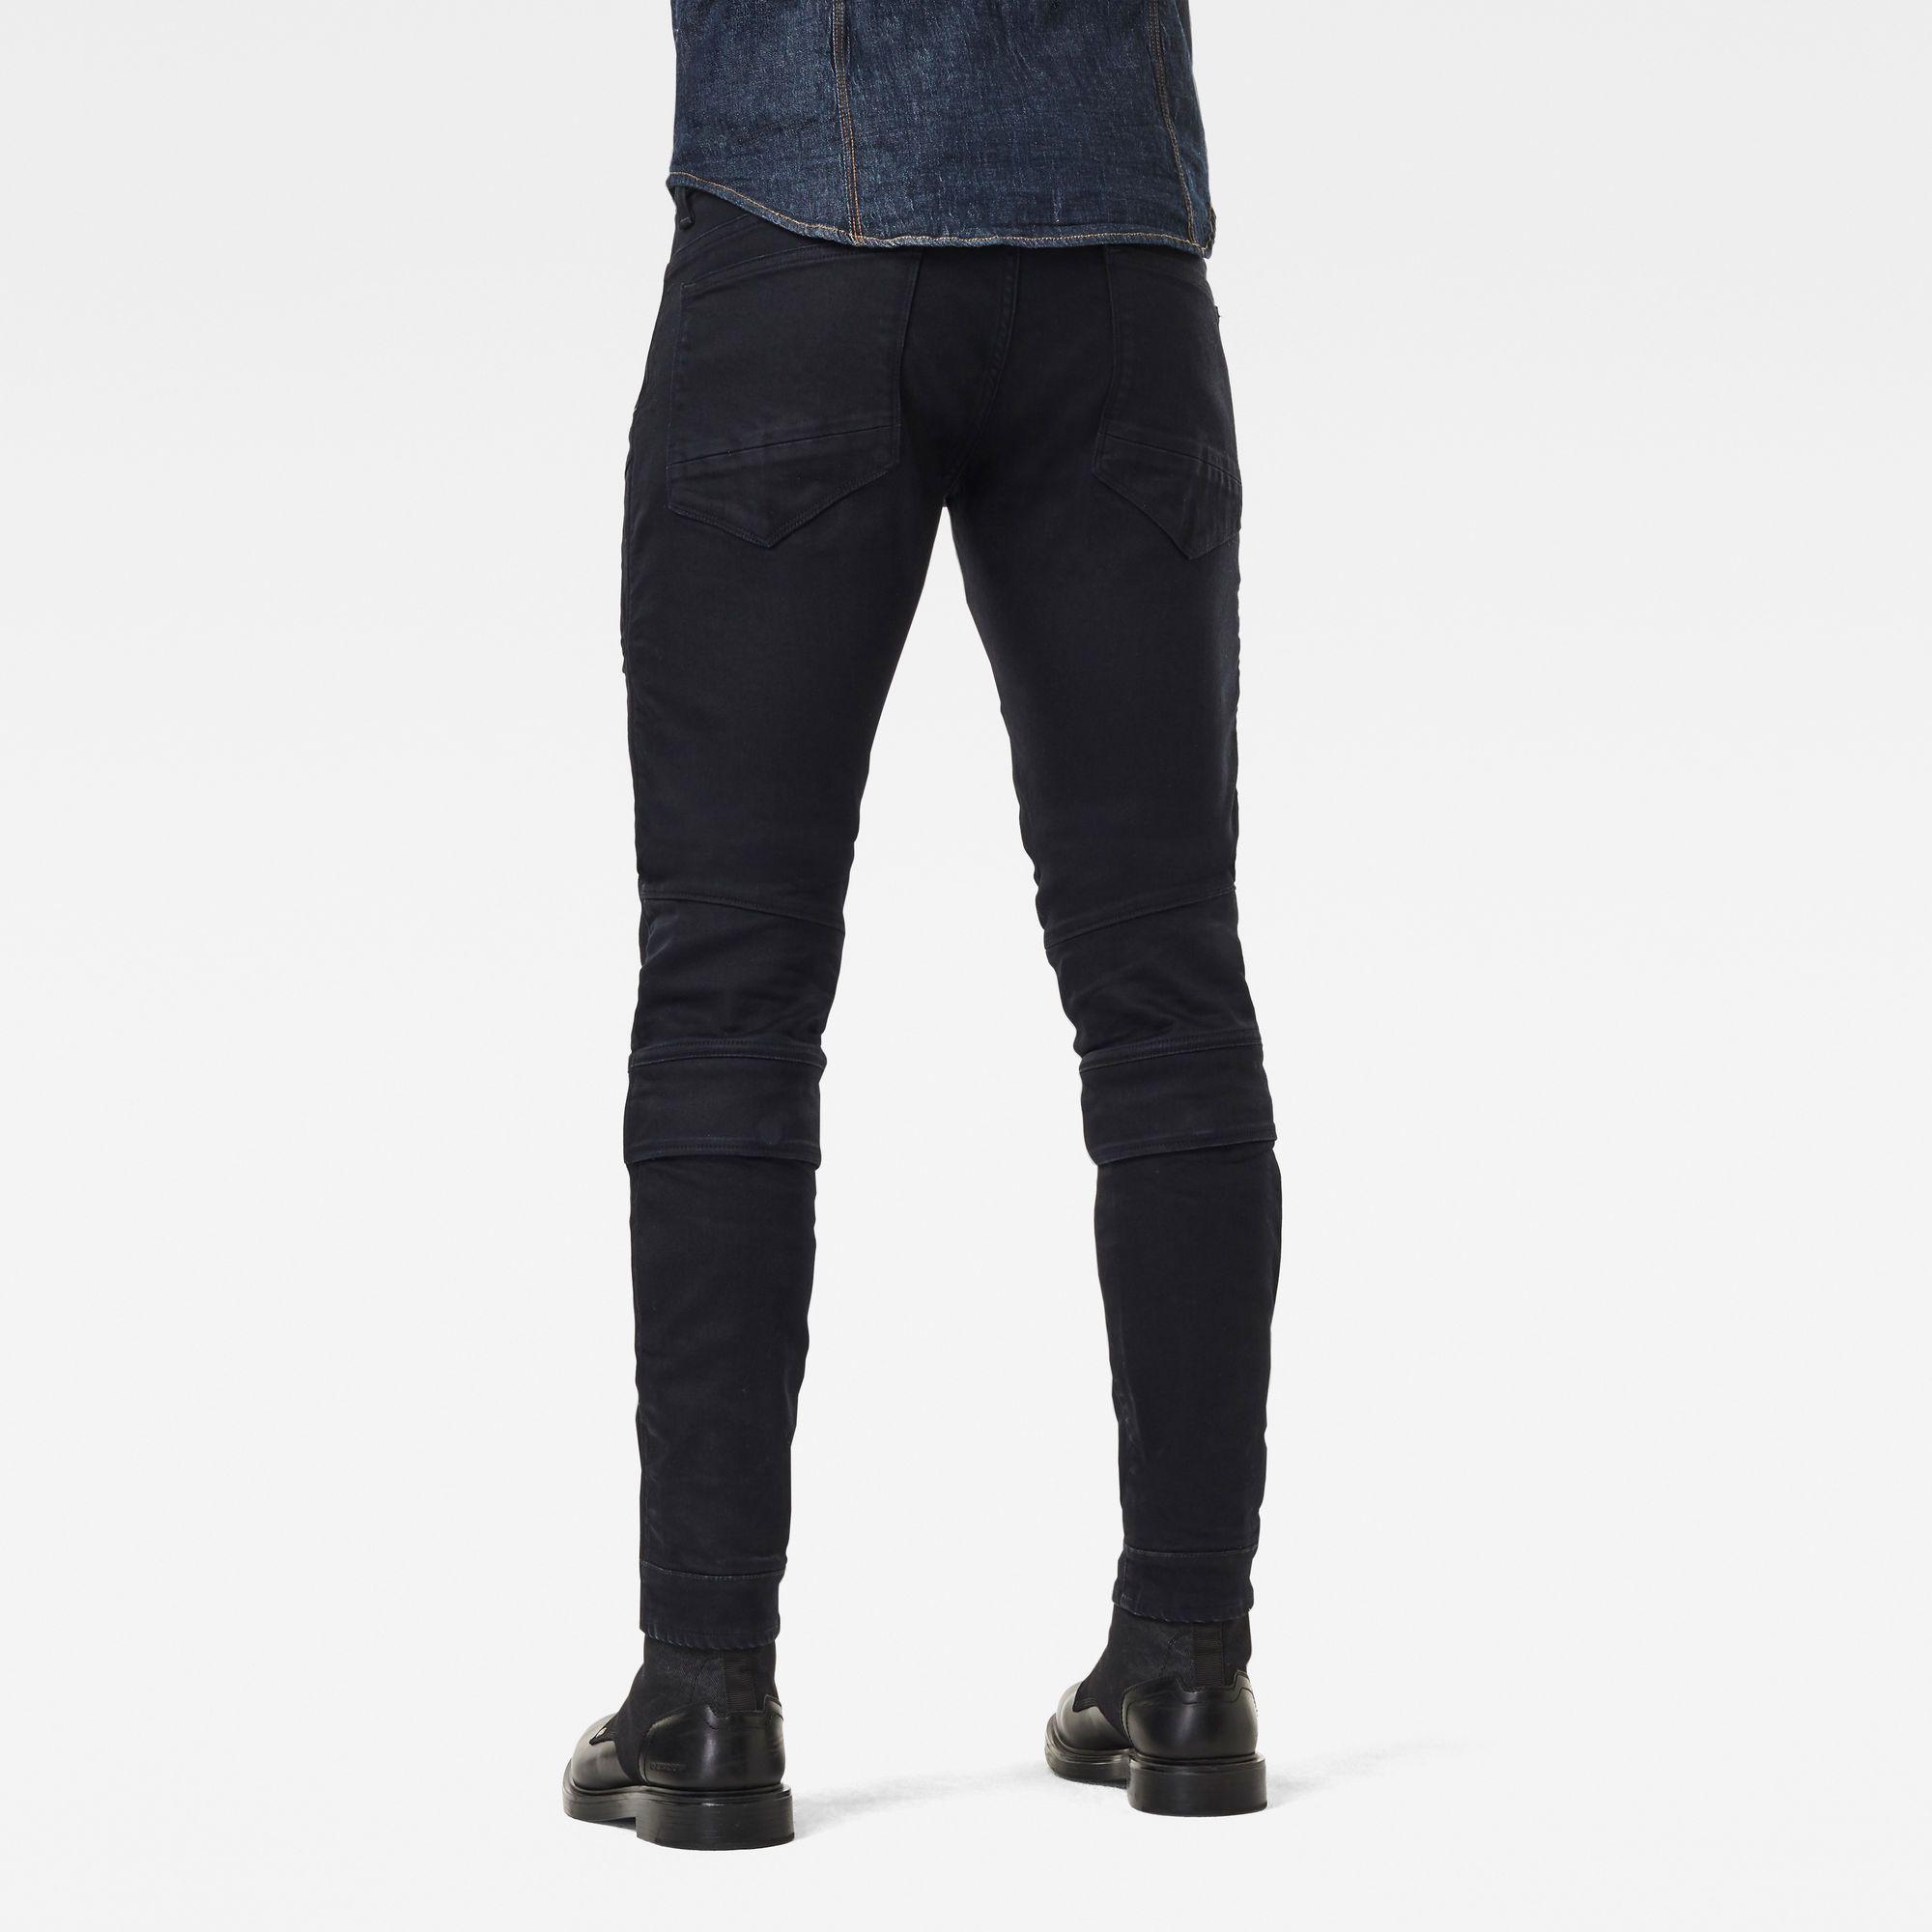 G-Star RAW Airblaze 3D Skinny Originals Pitch Black Jeans